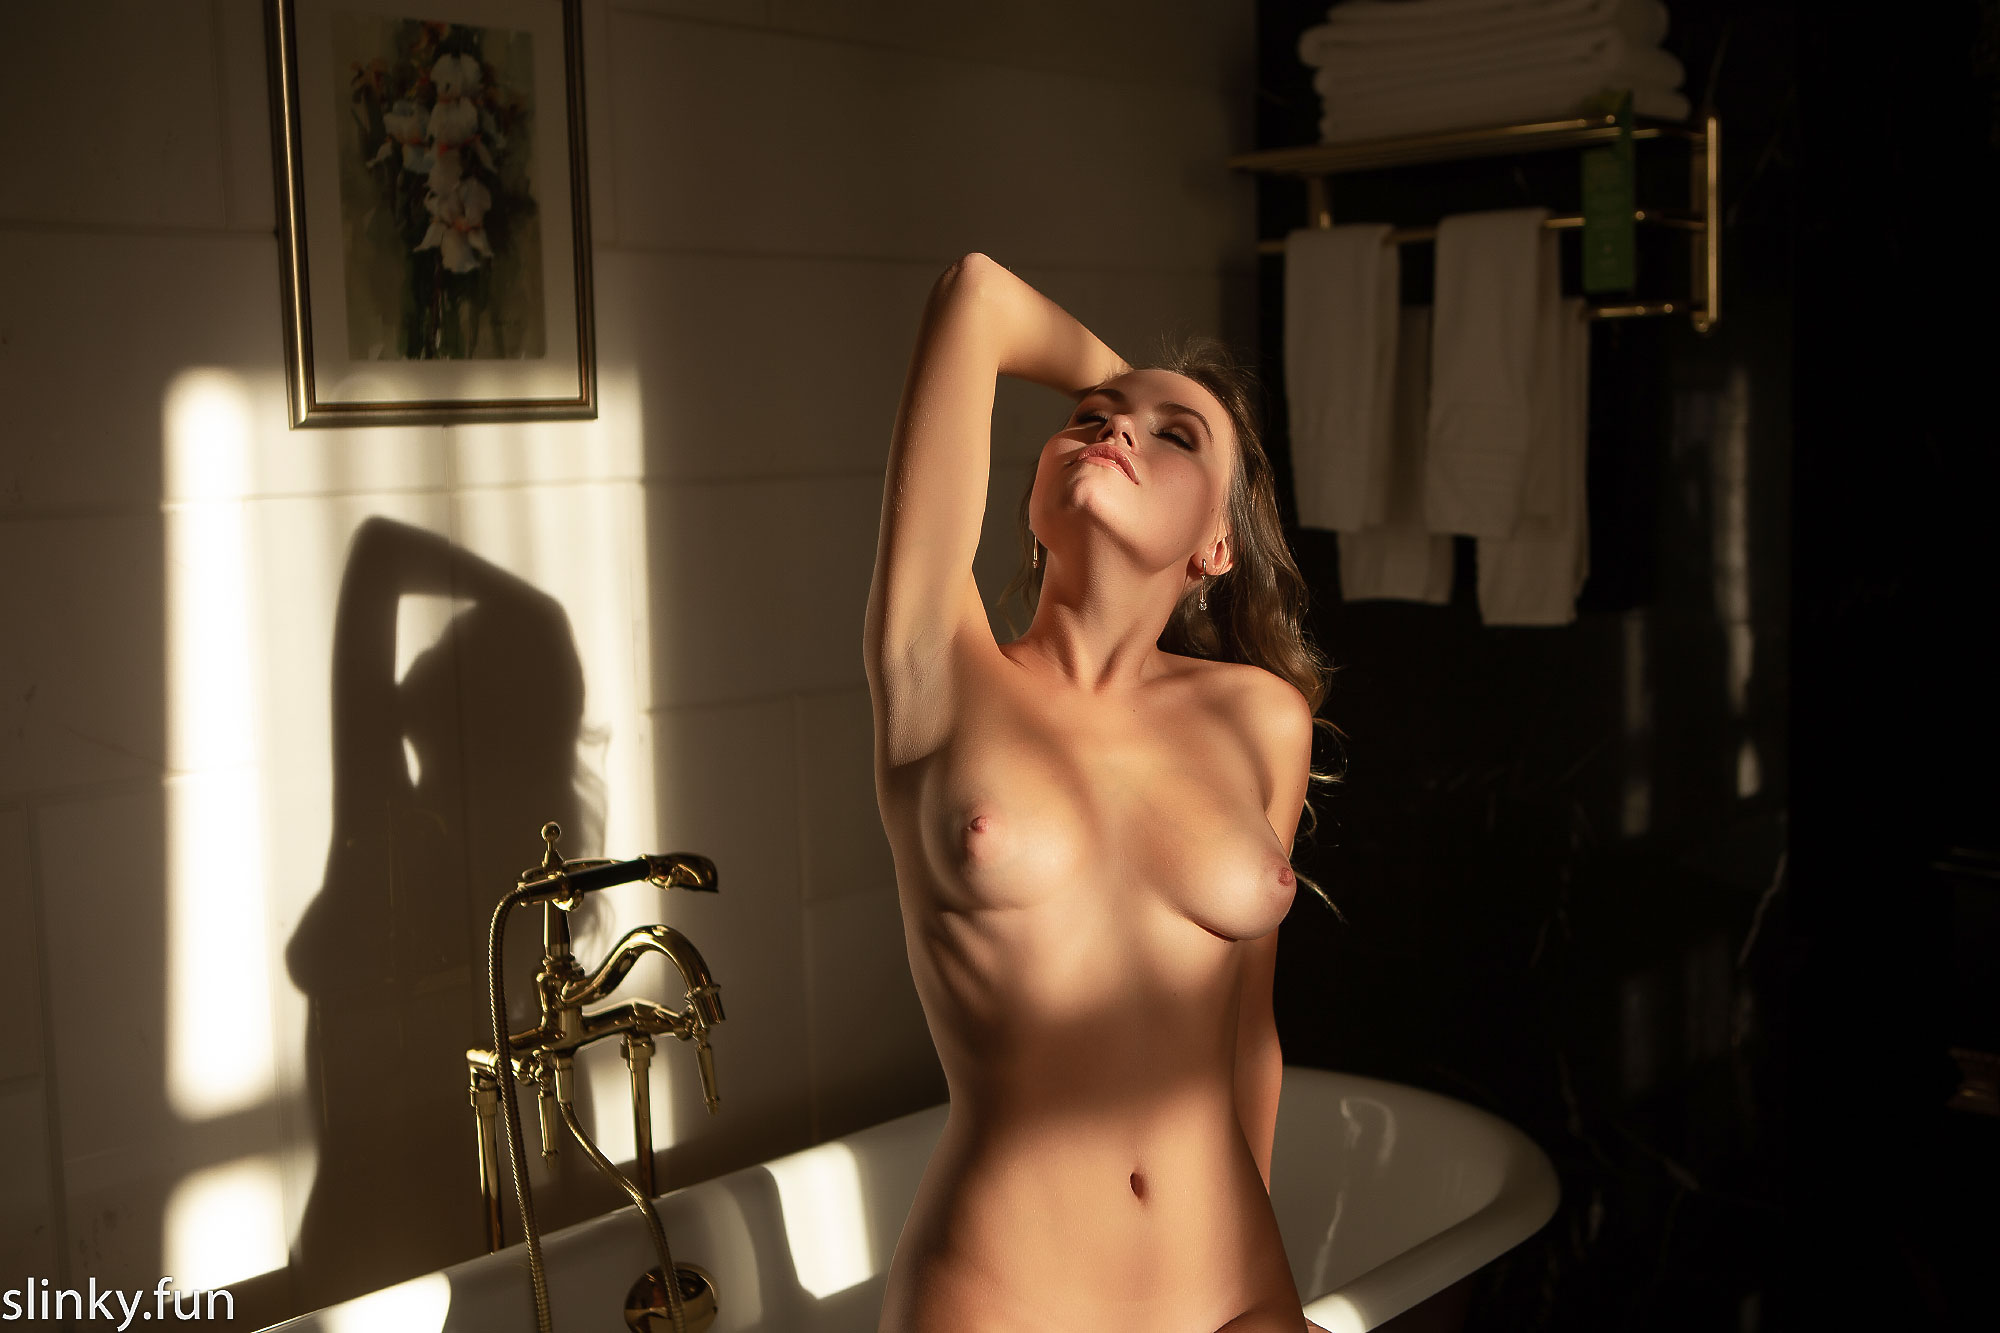 Proske nude jenn The Hottest